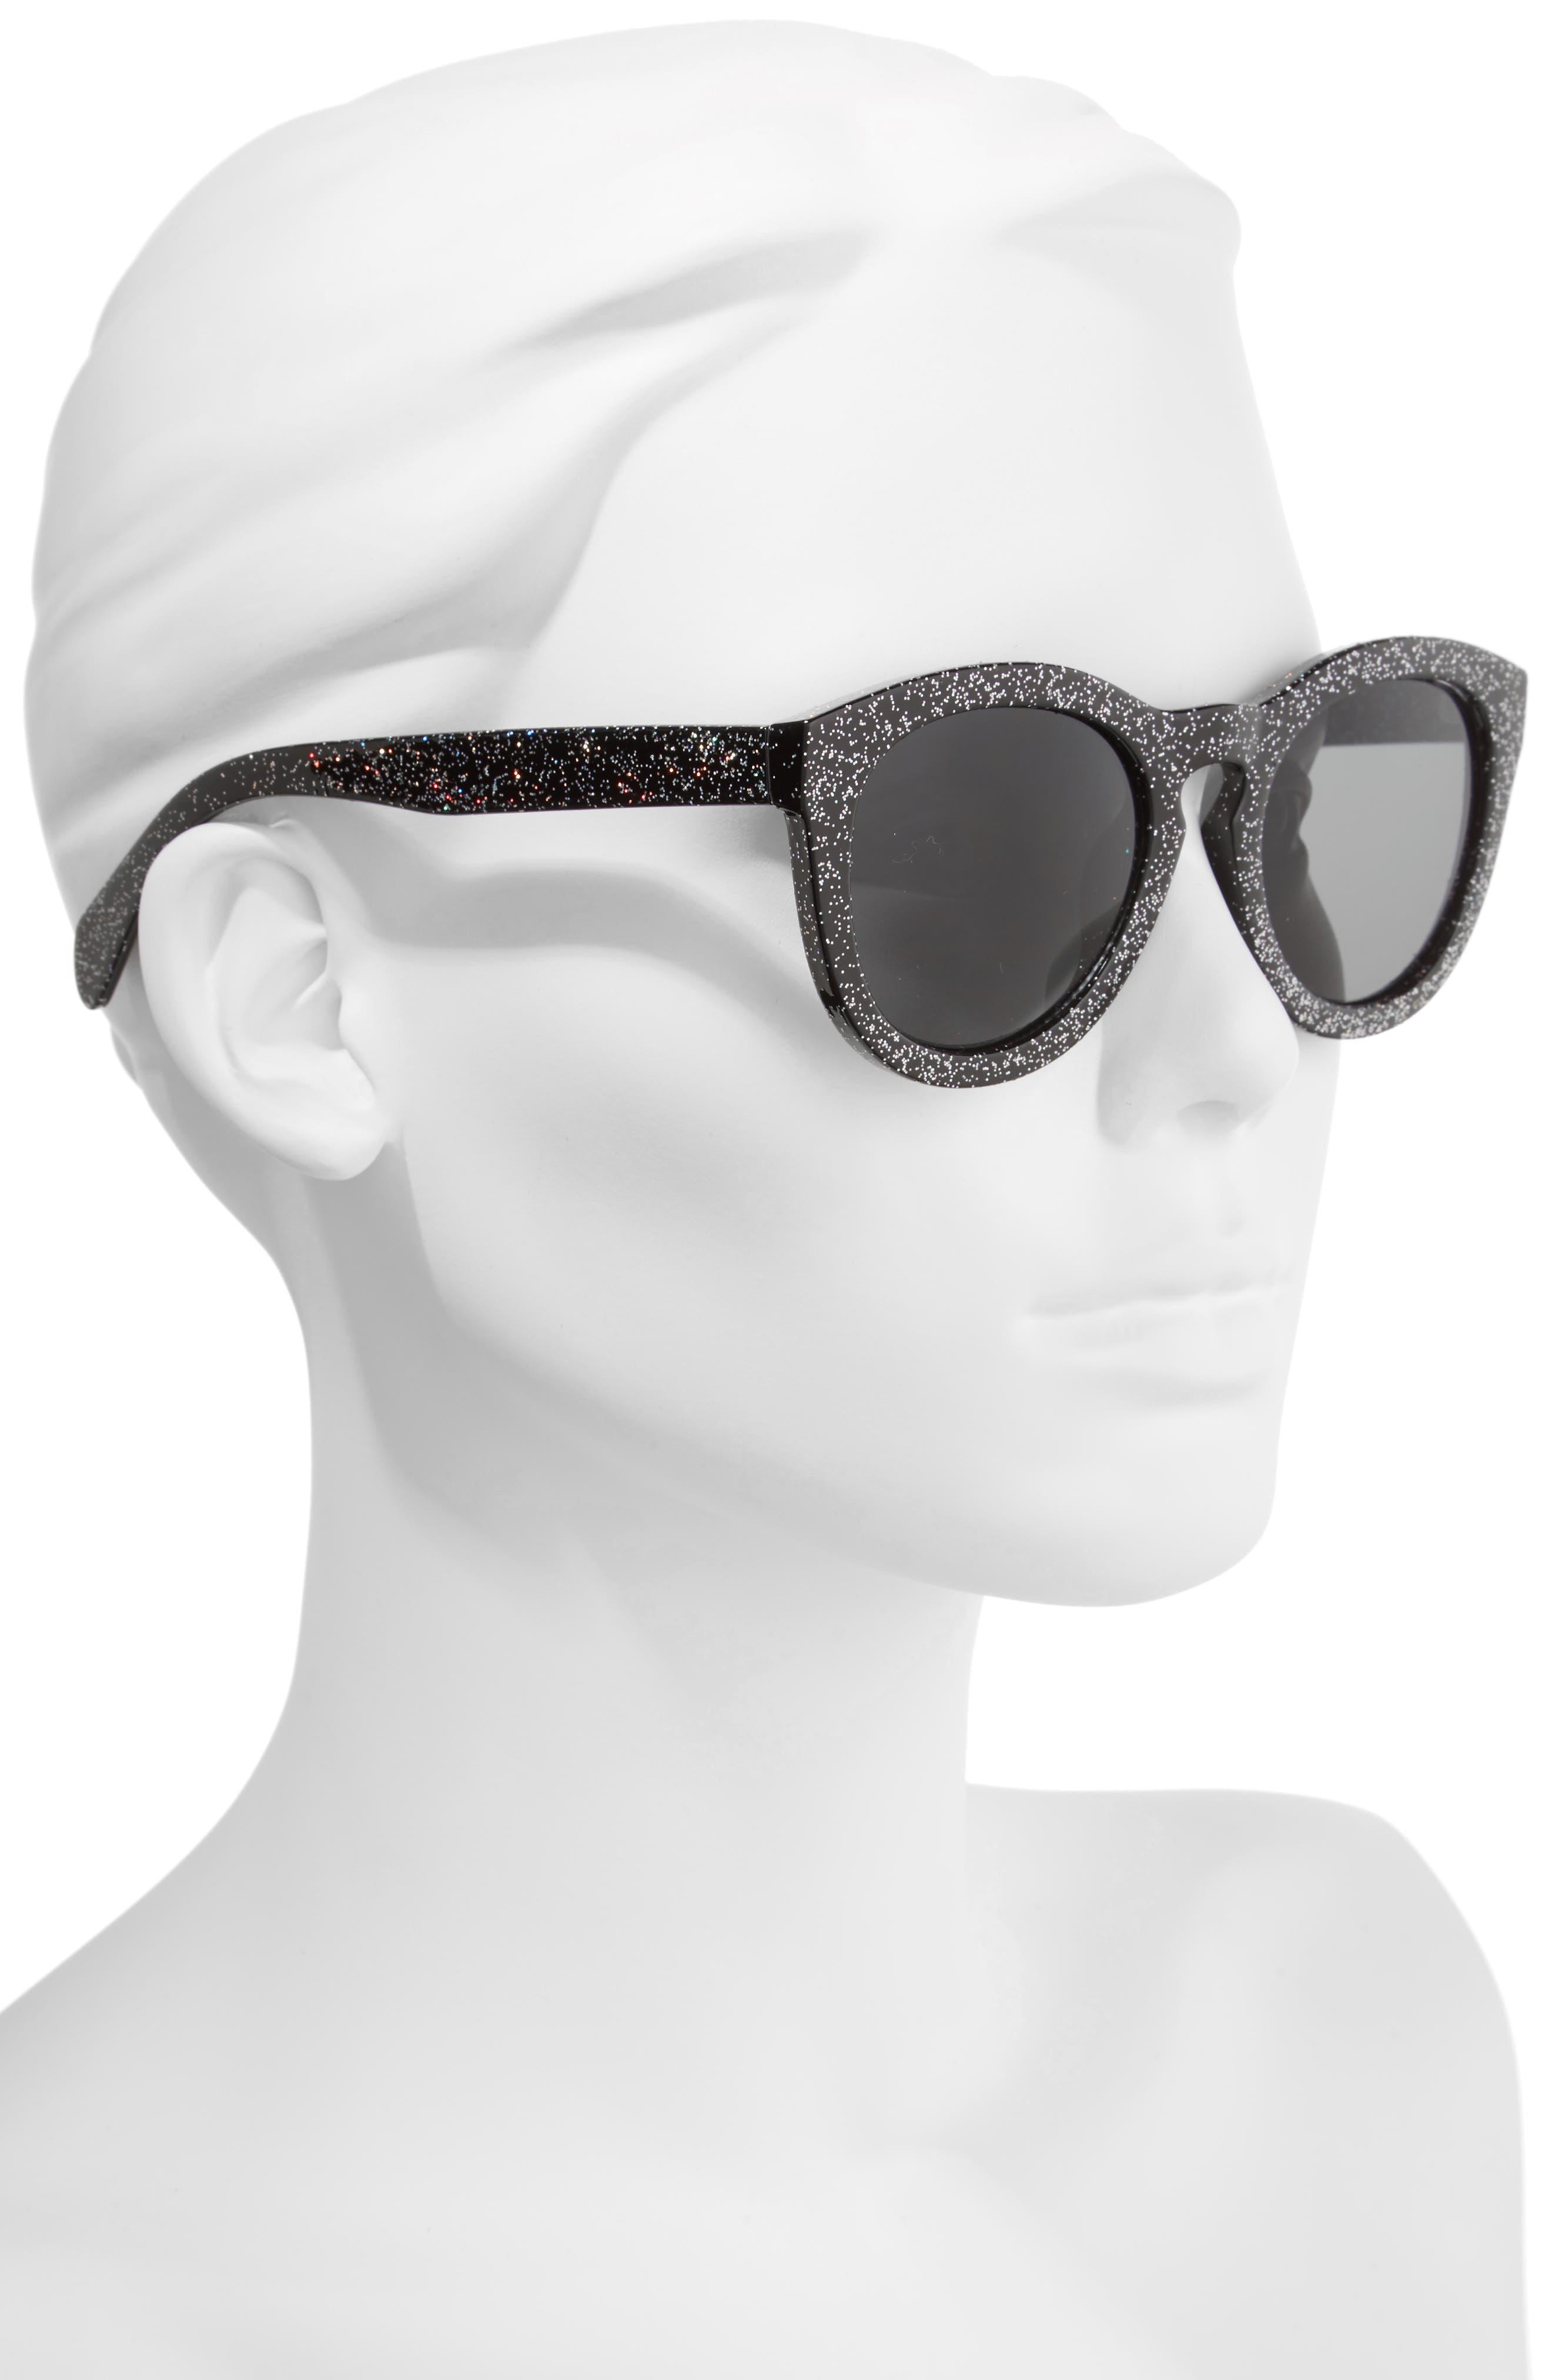 50mm Glitter Round Sunglasses,                             Alternate thumbnail 2, color,